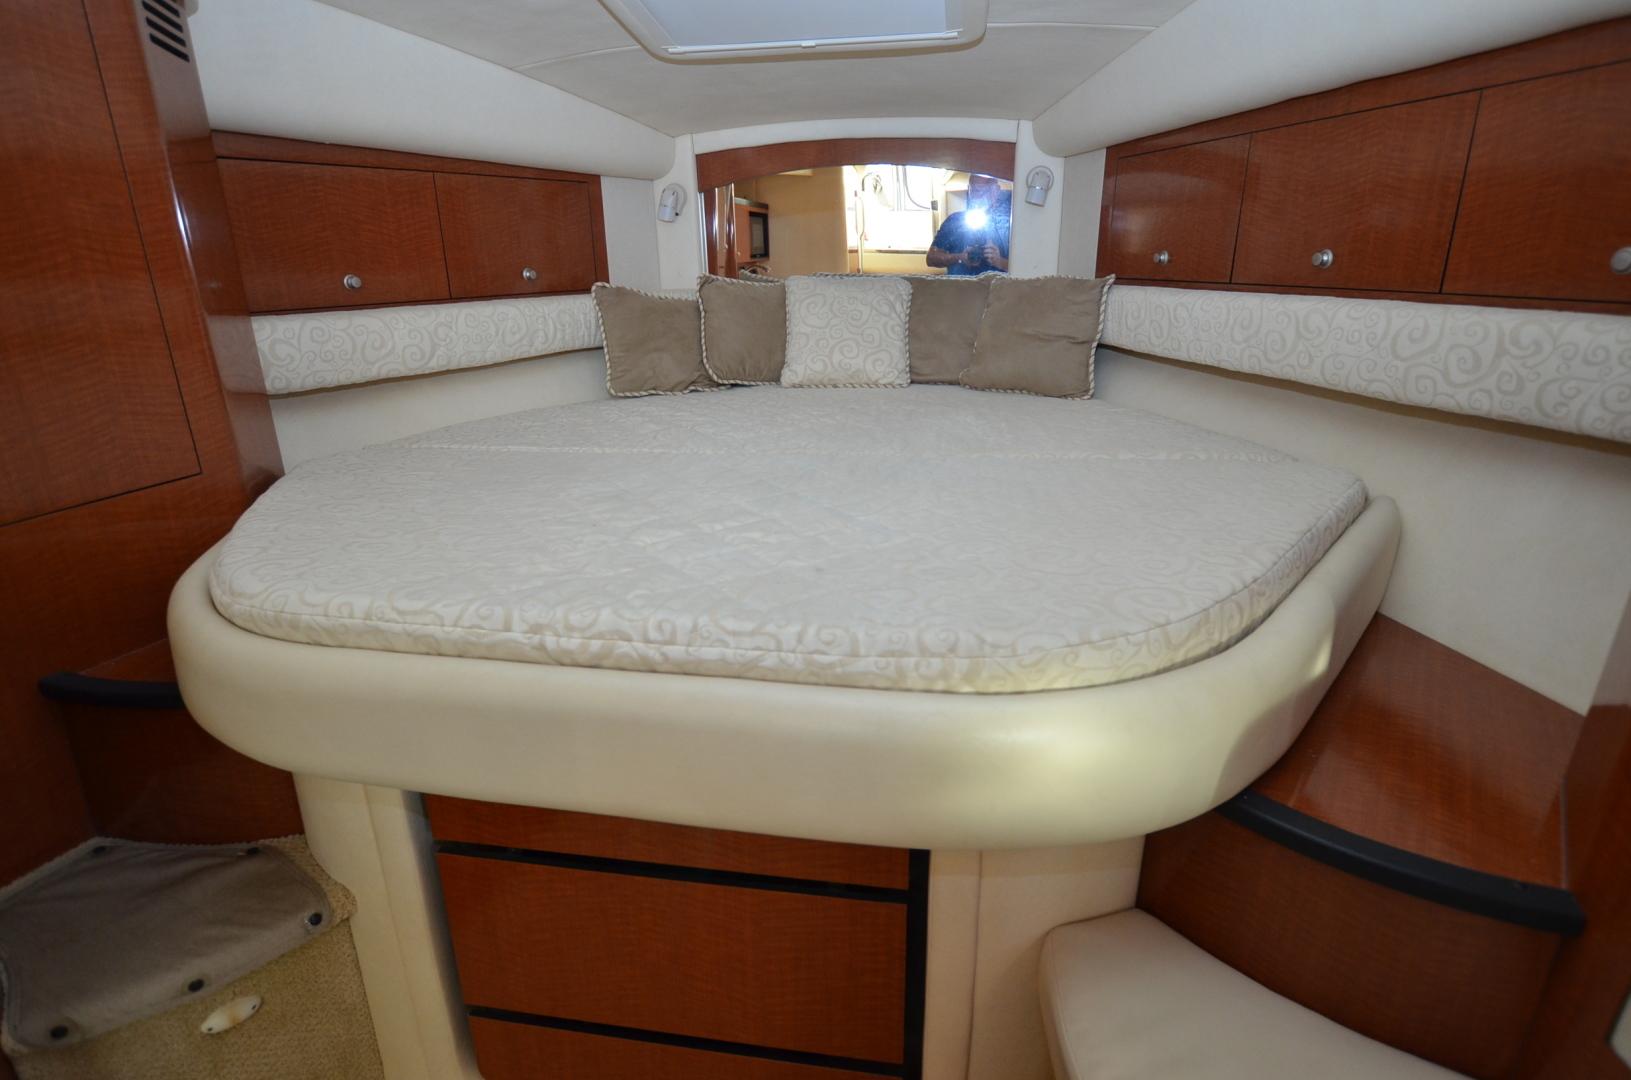 Sea Ray-340 Sundancer 2005-Better Place Palm Harbor-Florida-United States-1562826 | Thumbnail